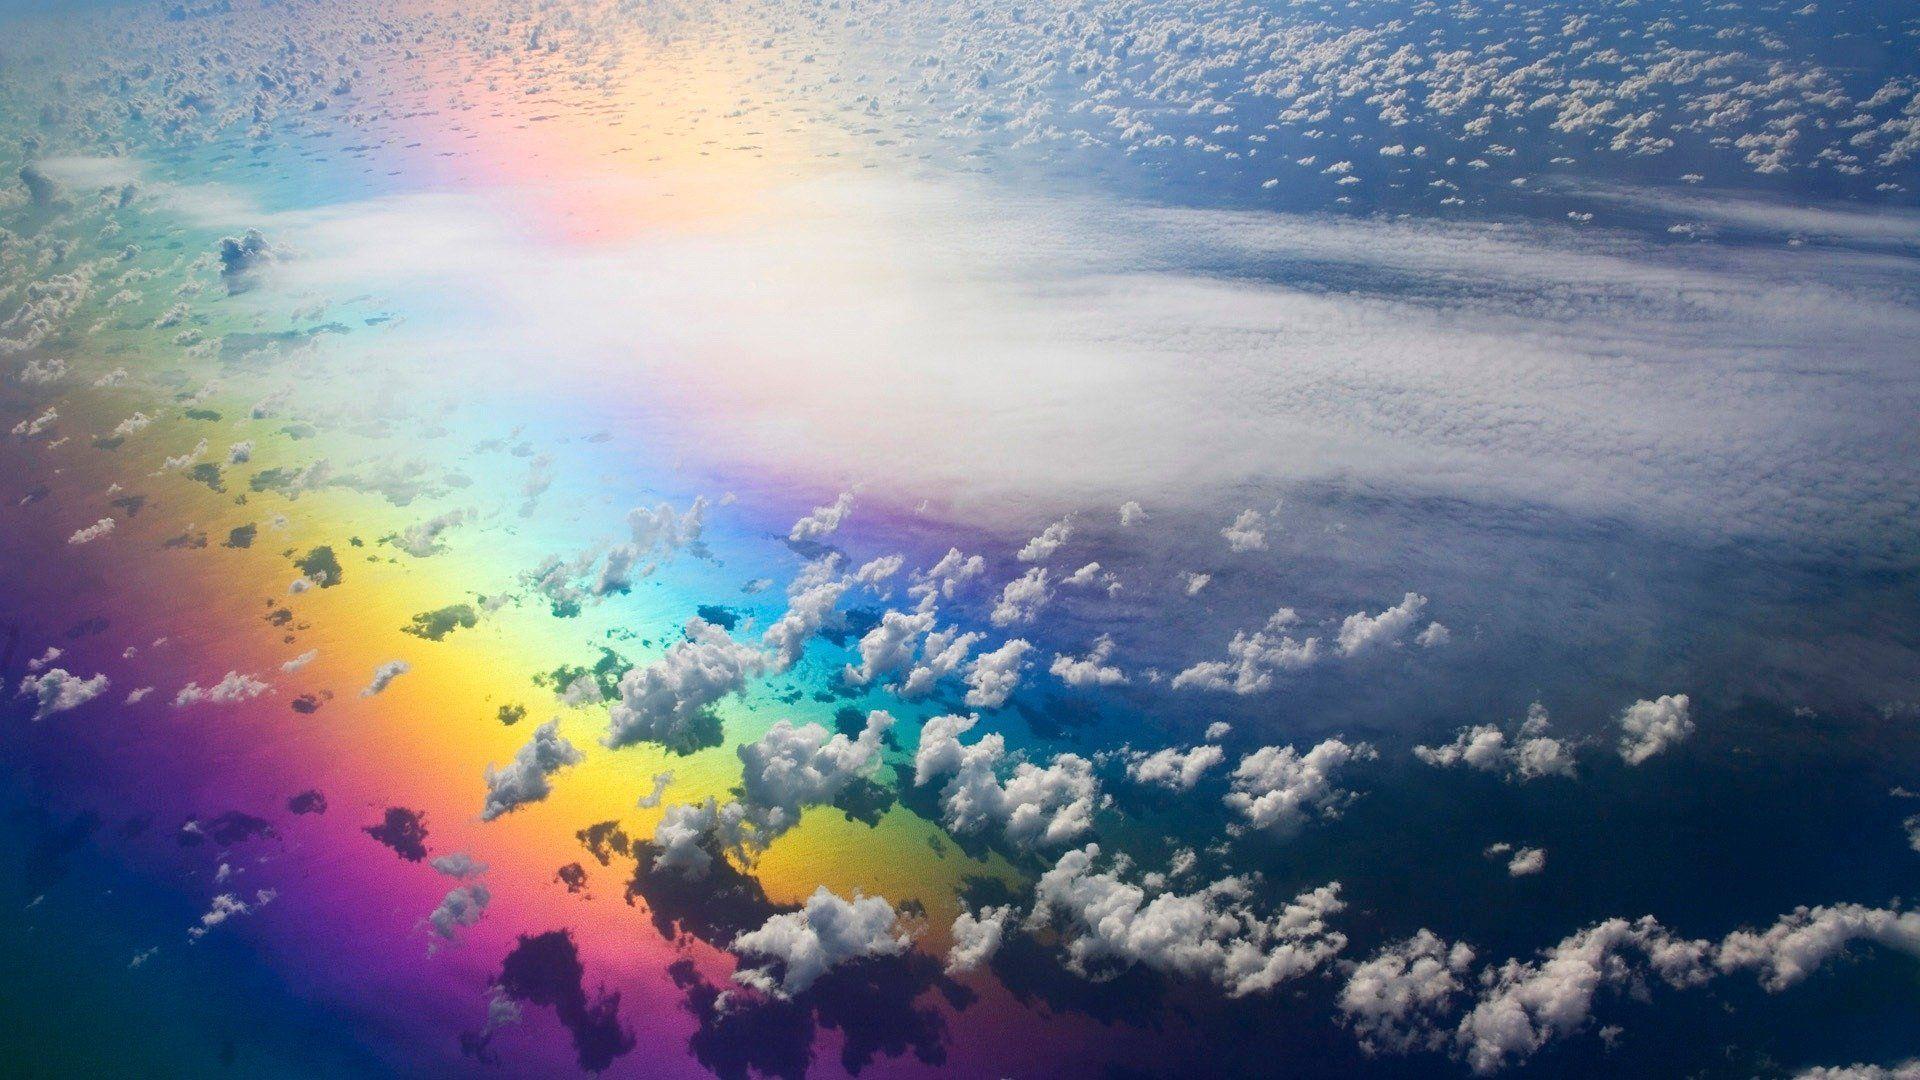 Rainbow Wallpaper free